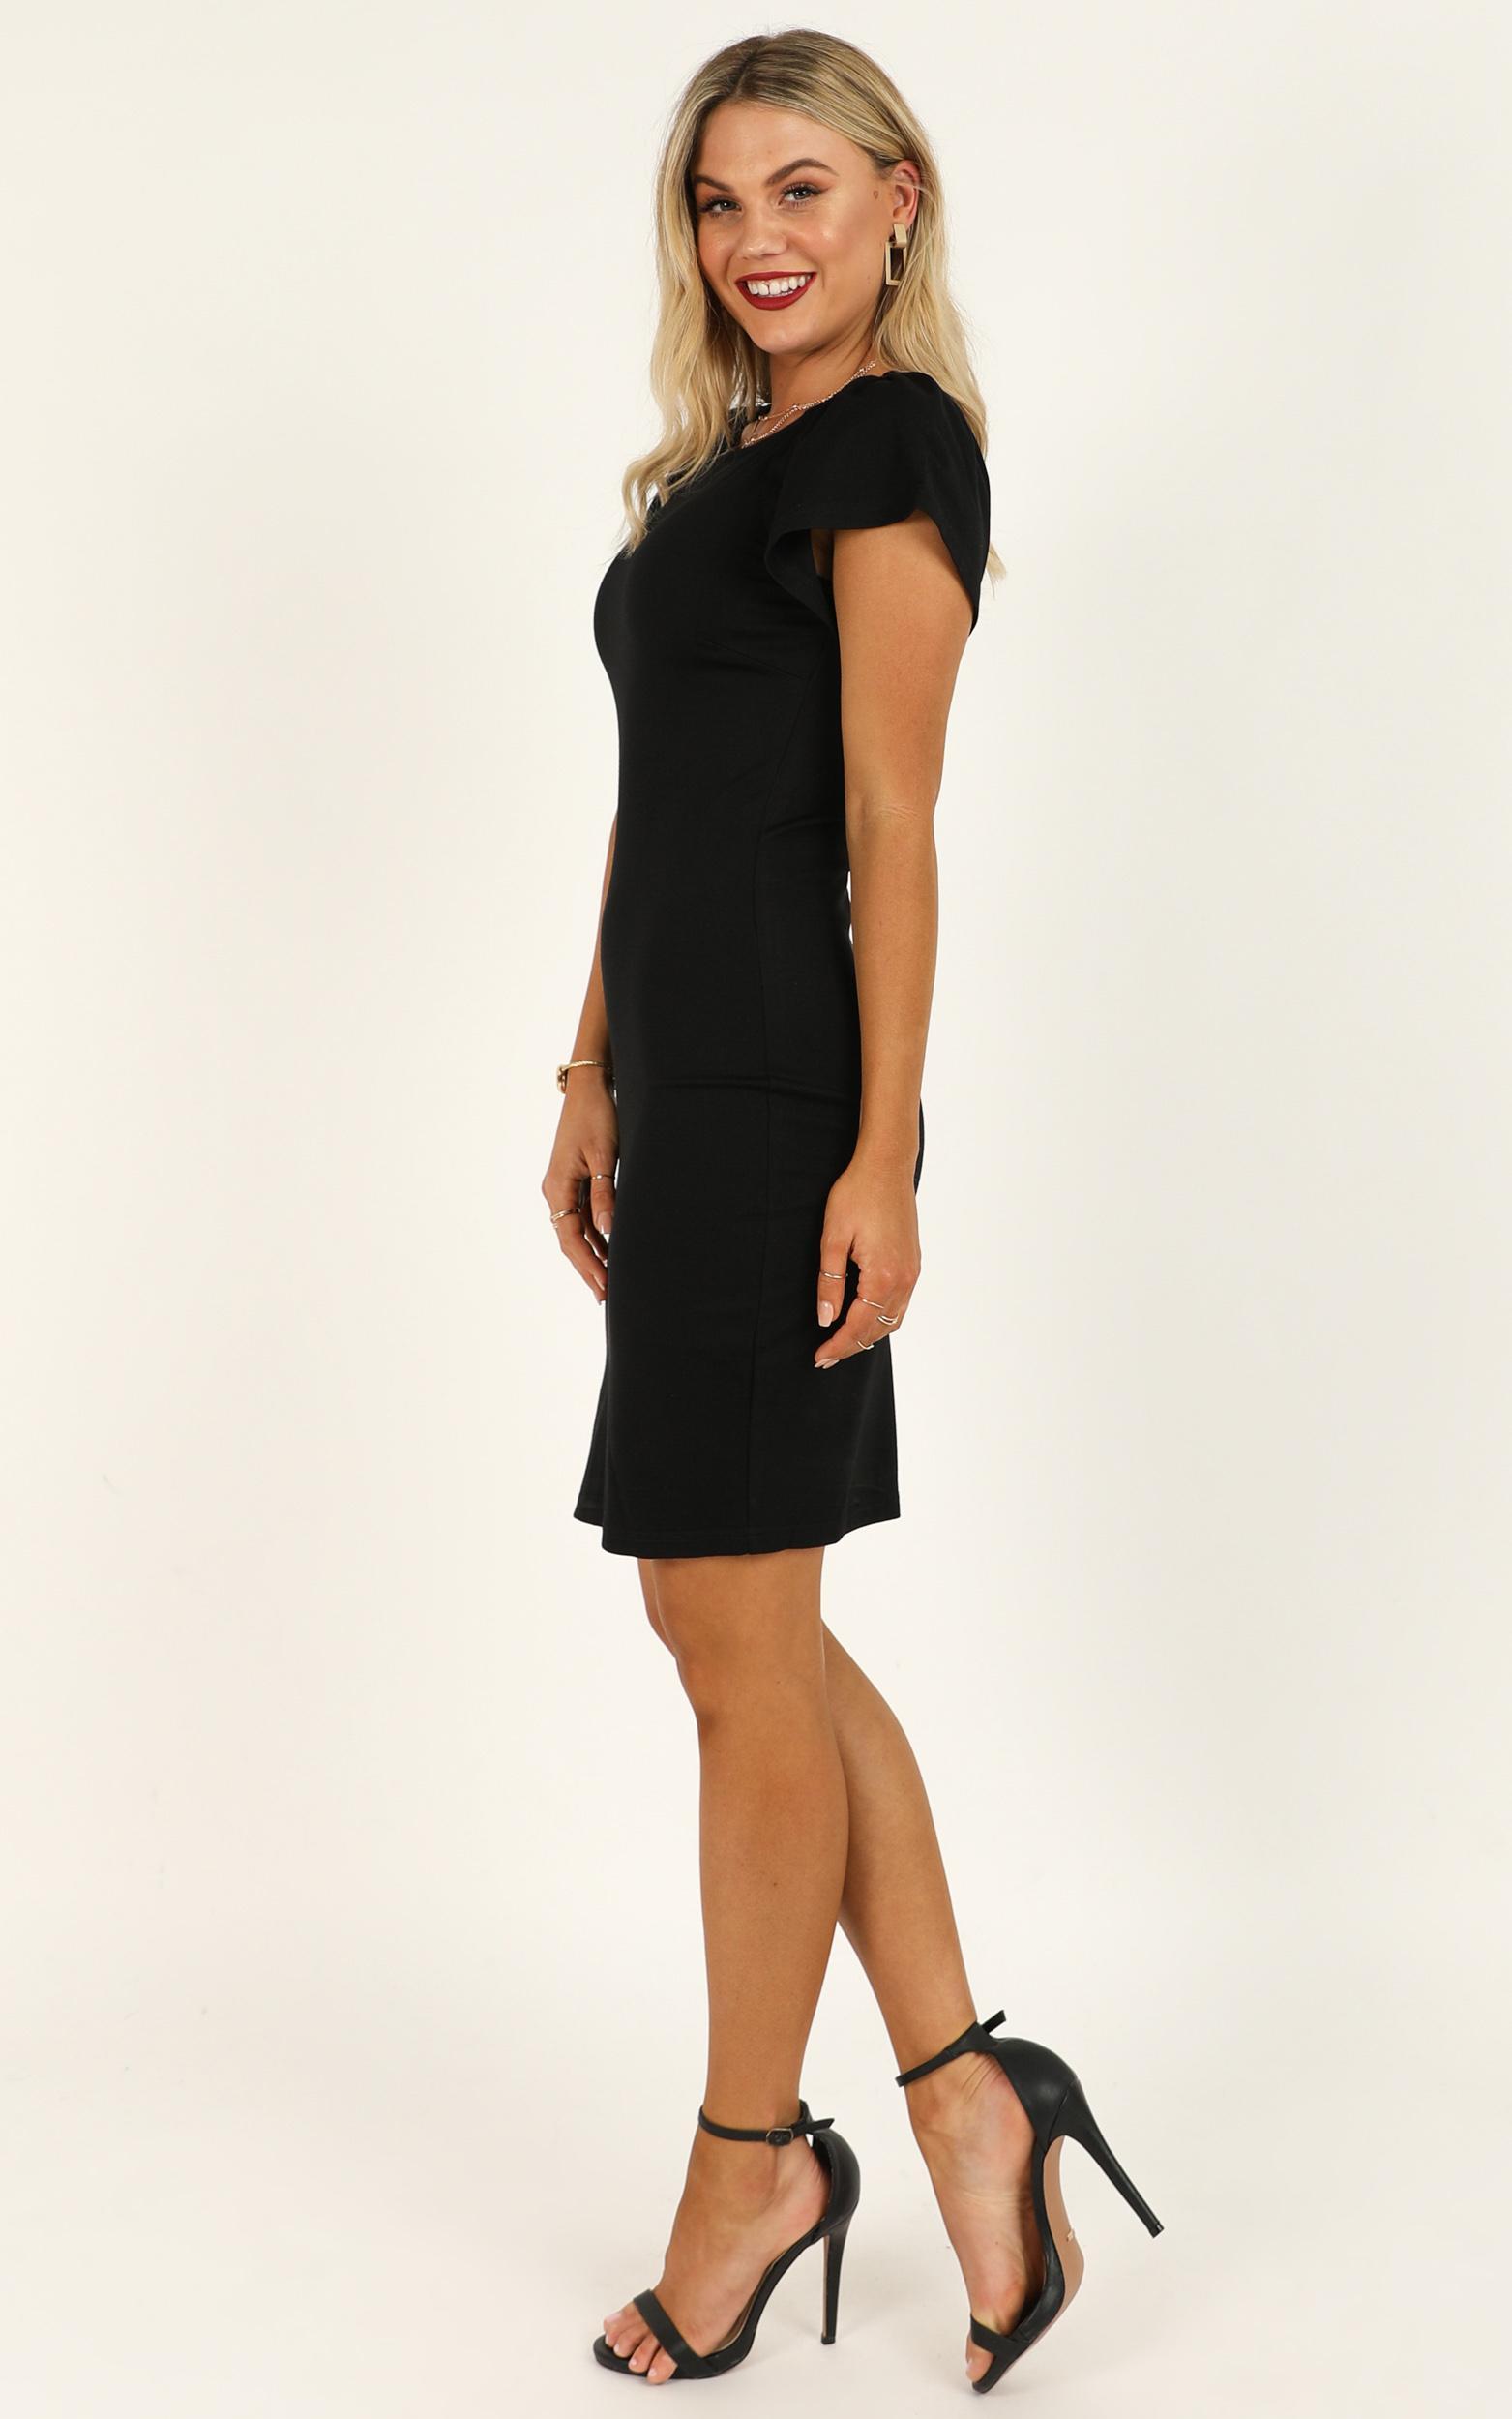 Dream Job Dress in black - 20 (XXXXL), Black, hi-res image number null